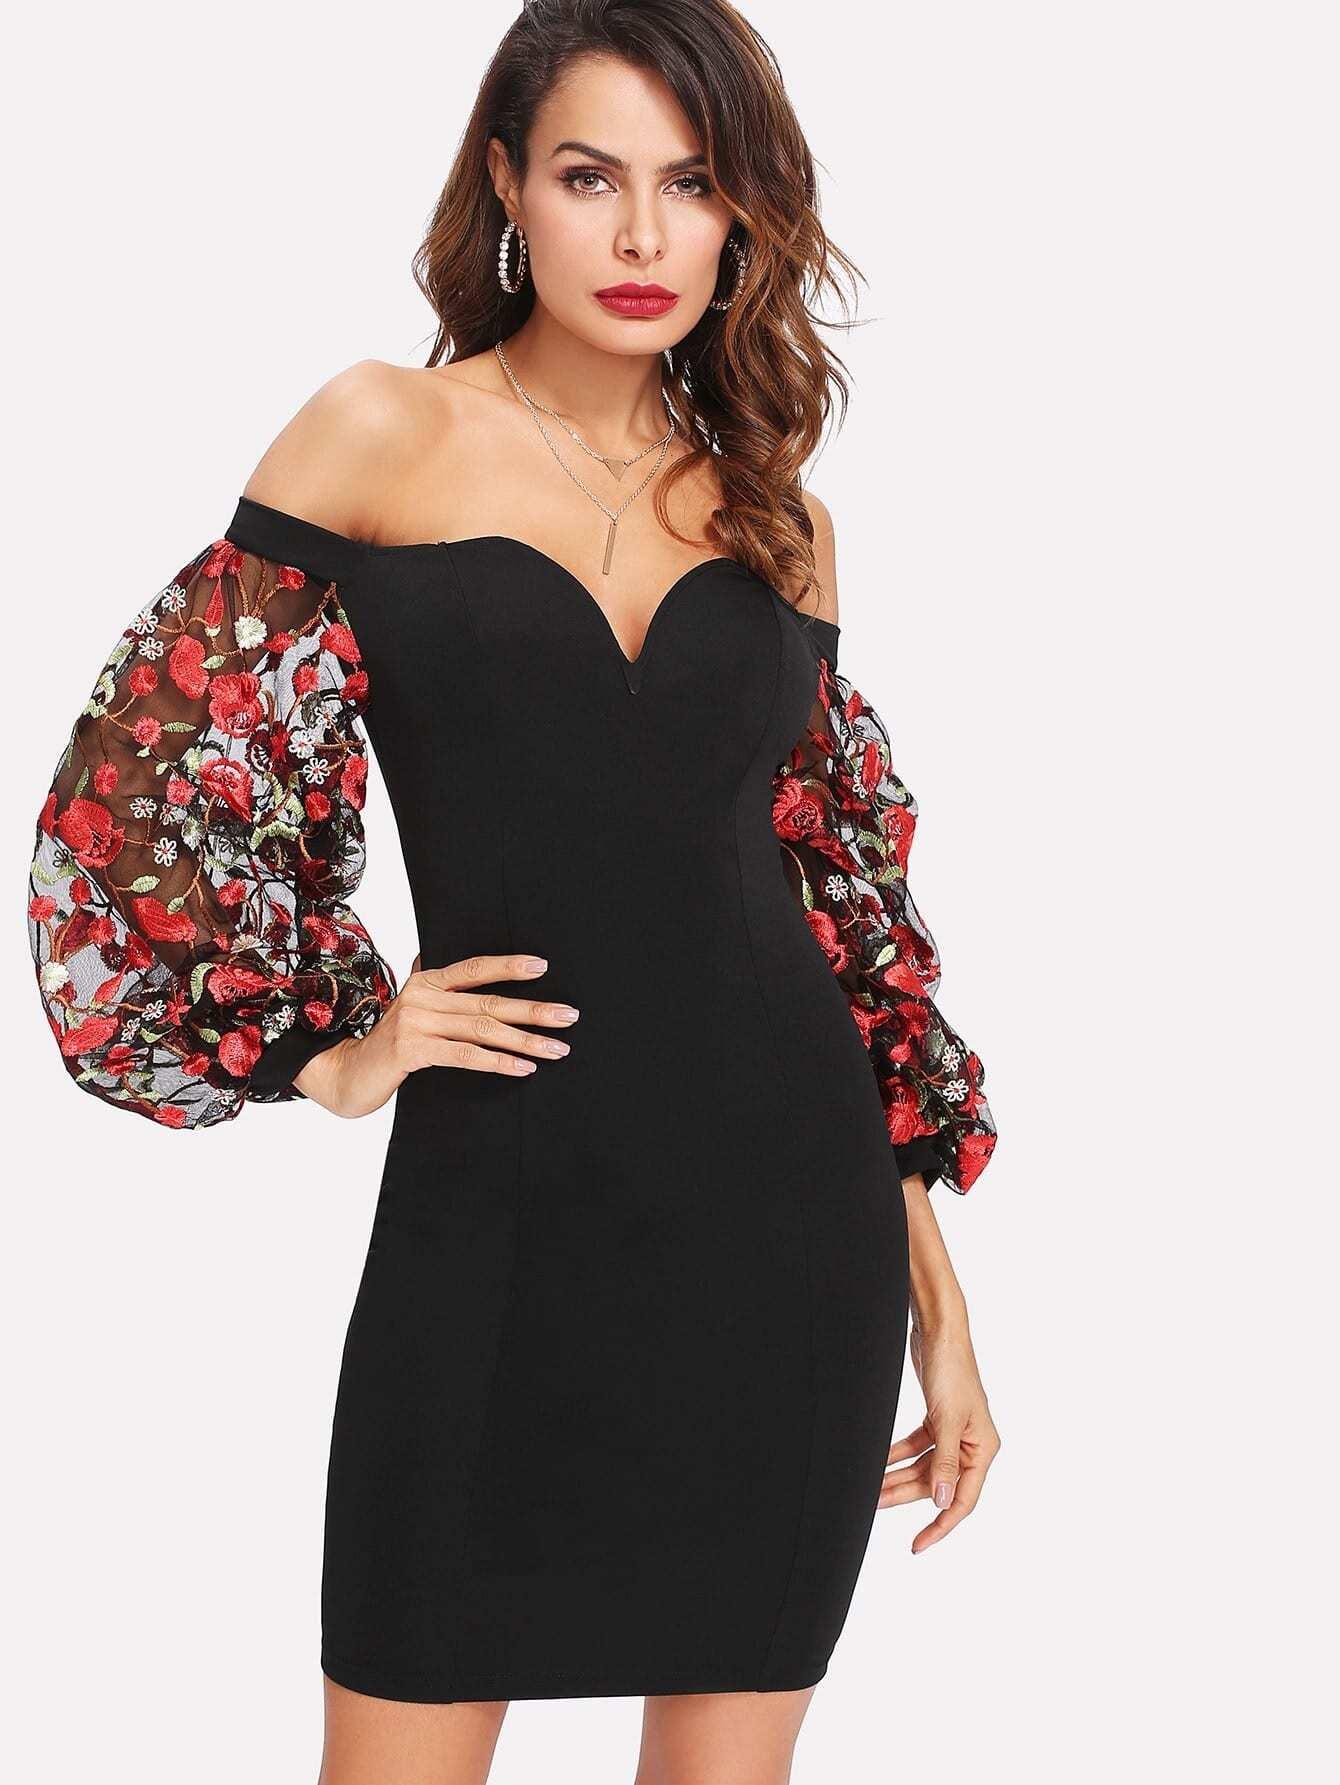 Embroidered Mesh Sleeve Sweetheart Bardot Dress bardot pencil dress with embroidered mesh sleeve